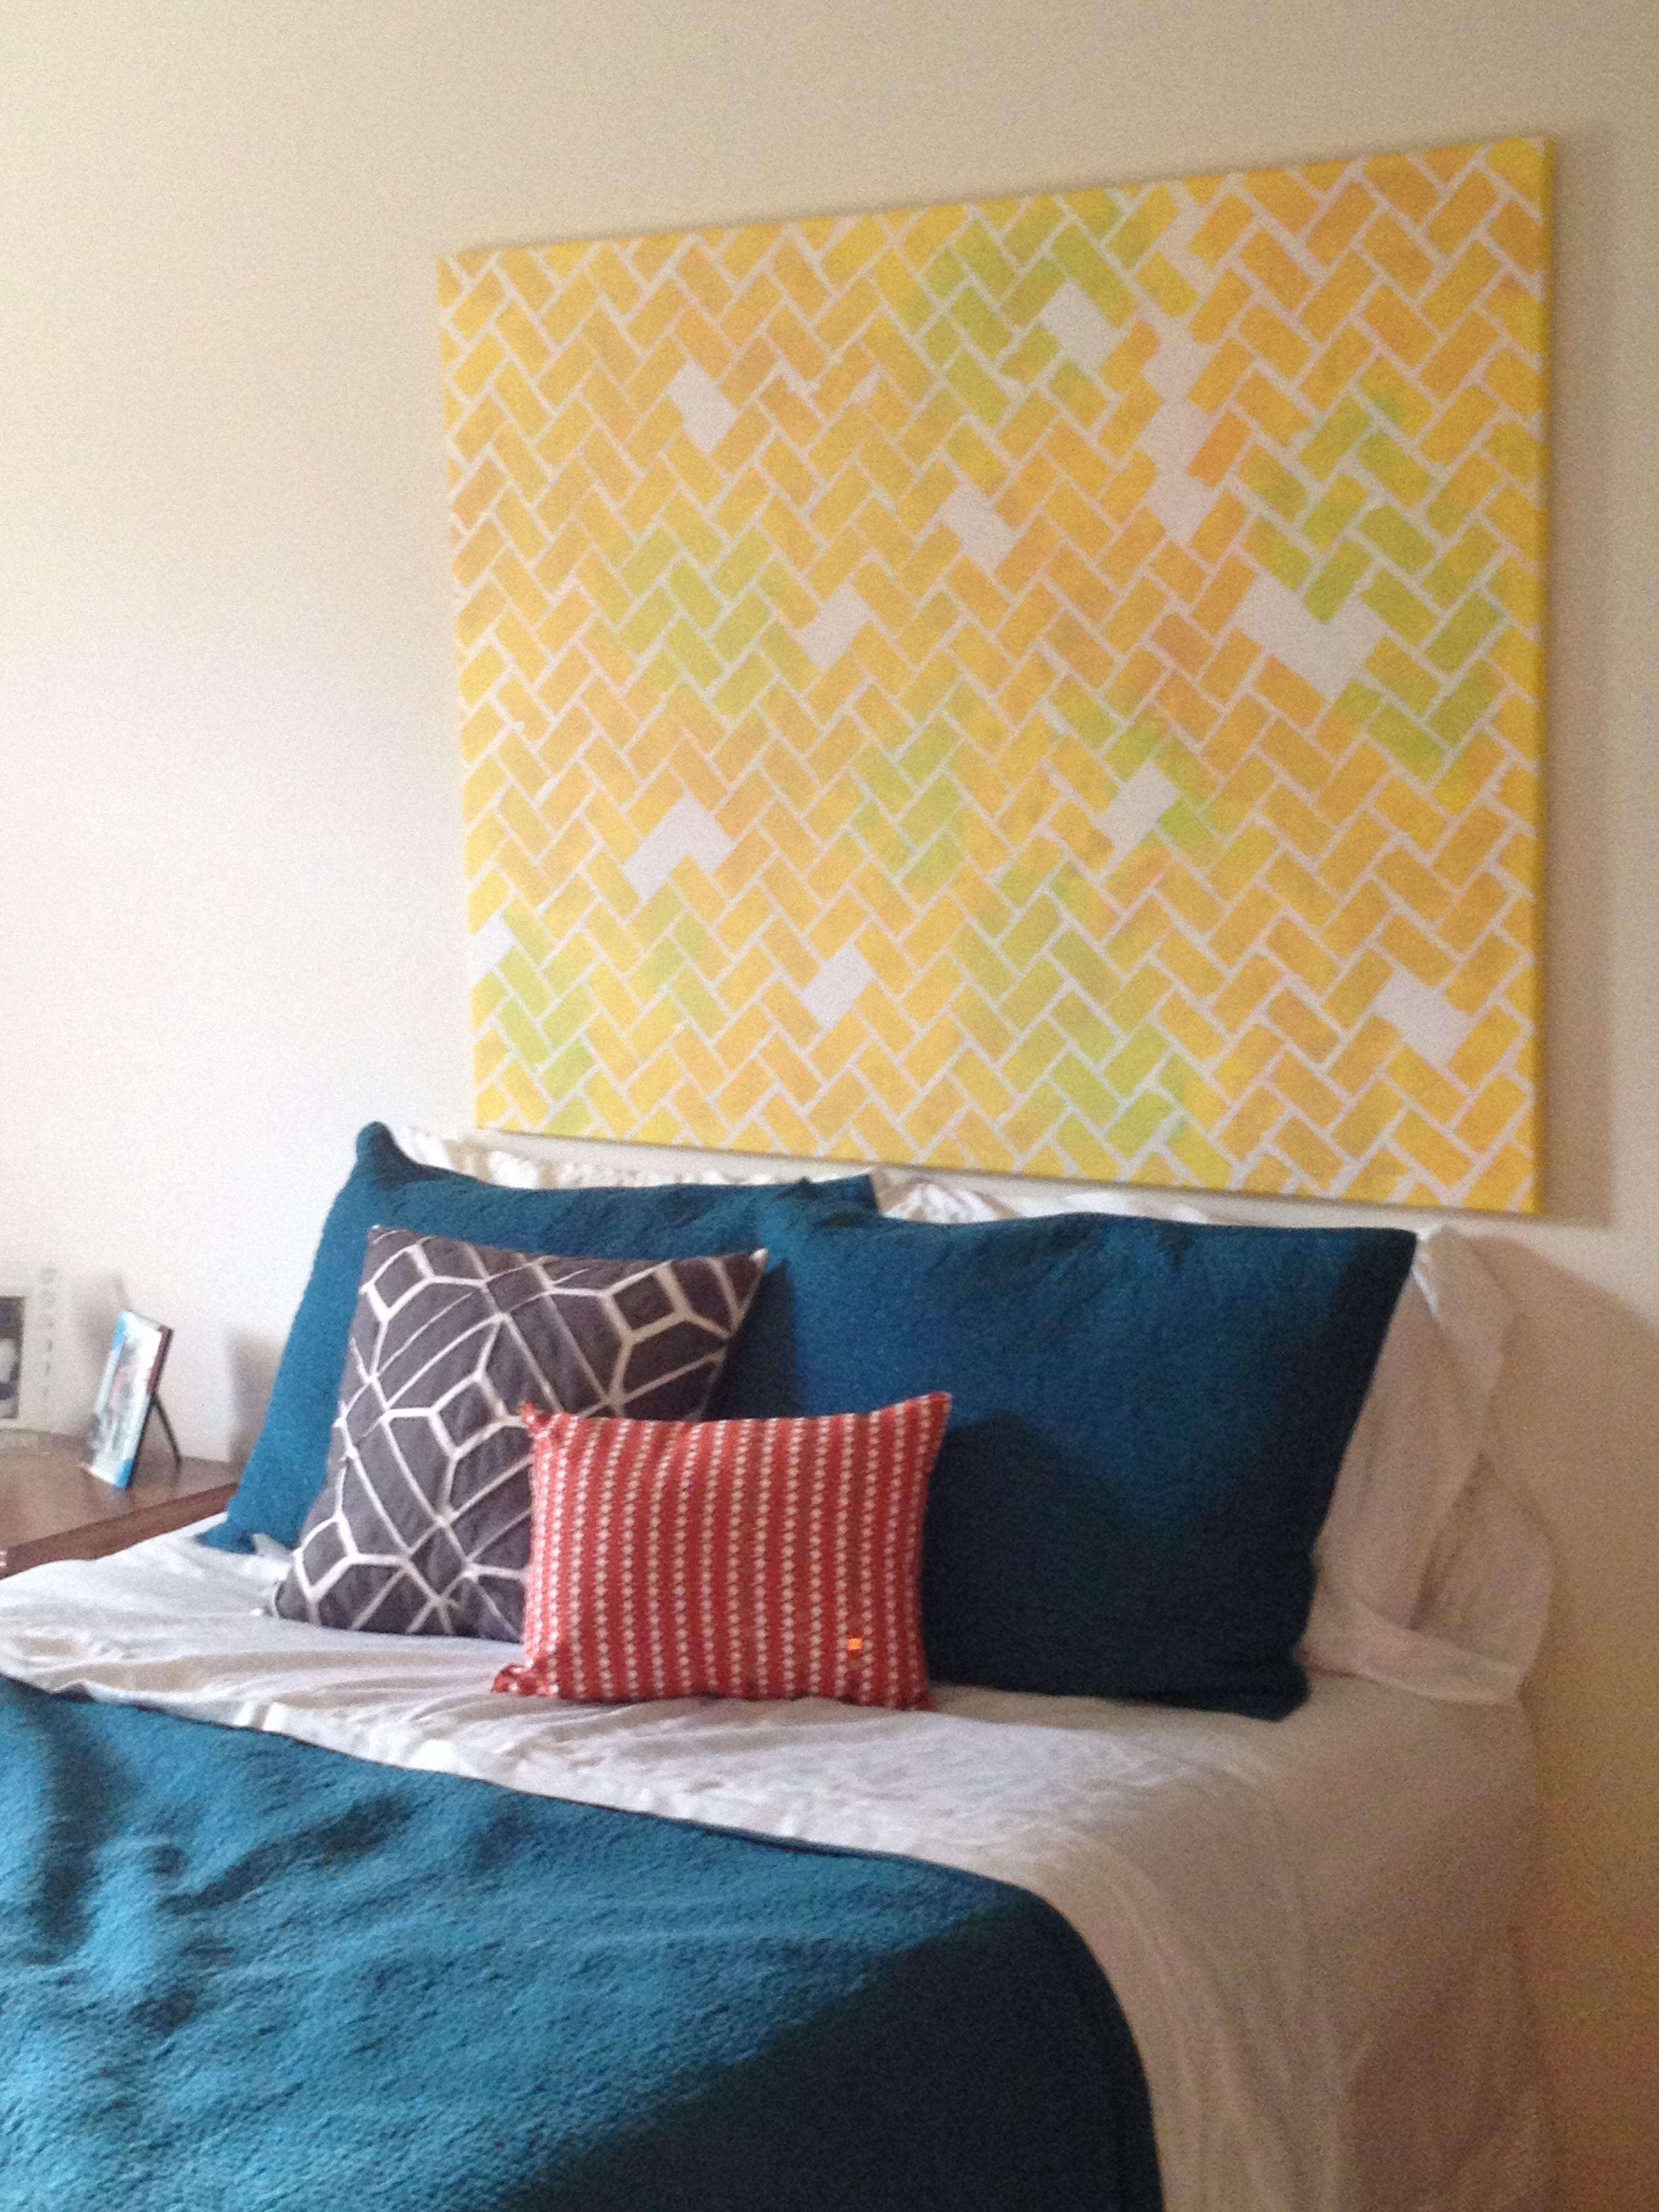 My own DIY canvas headboard | Things I Love | Pinterest | Canvas ...